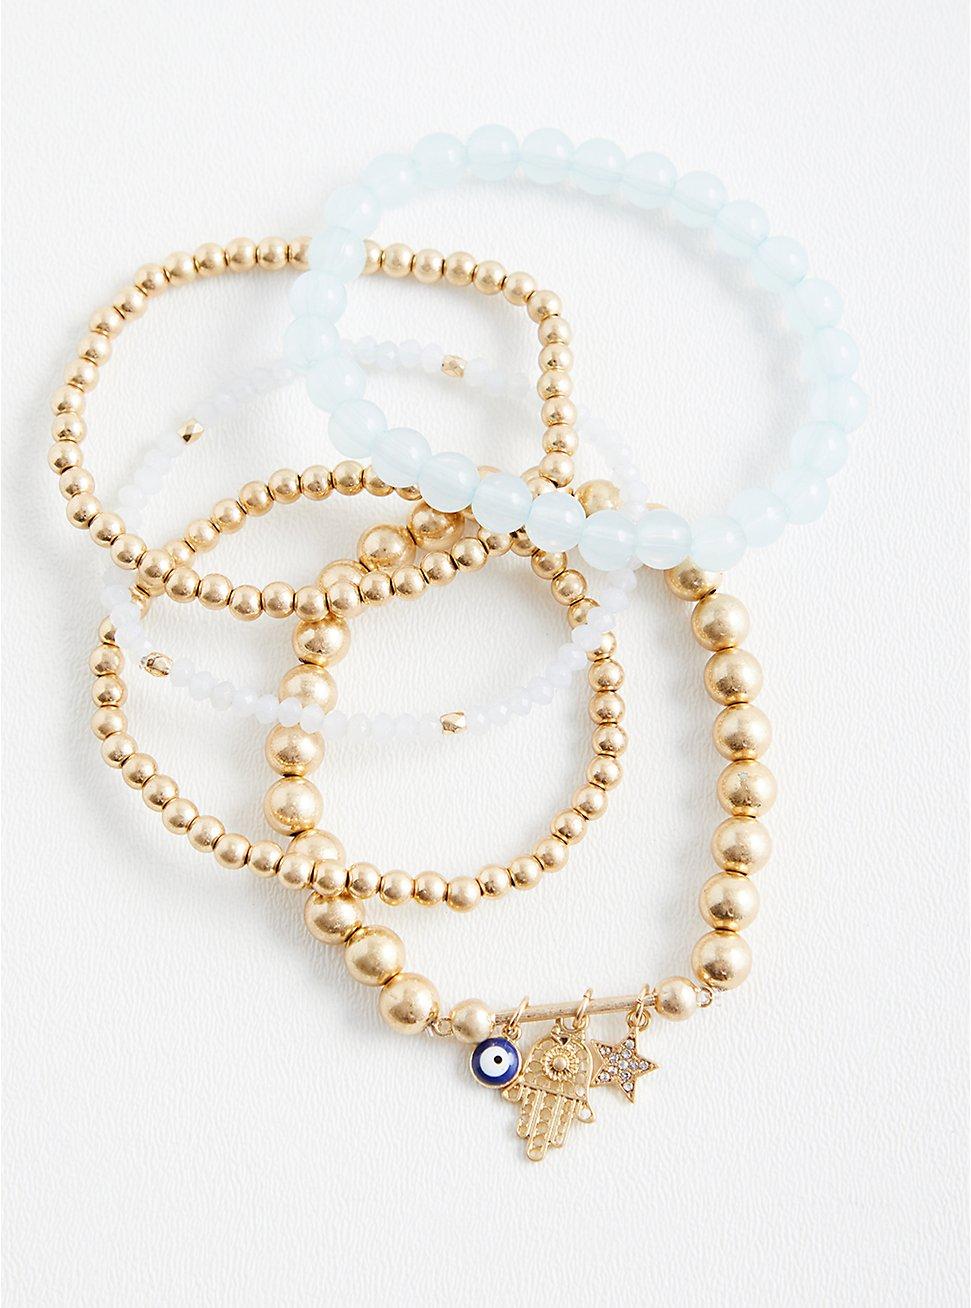 Gold Tone Beaded Hamsa Bracelet - Set of 5, GOLD, hi-res